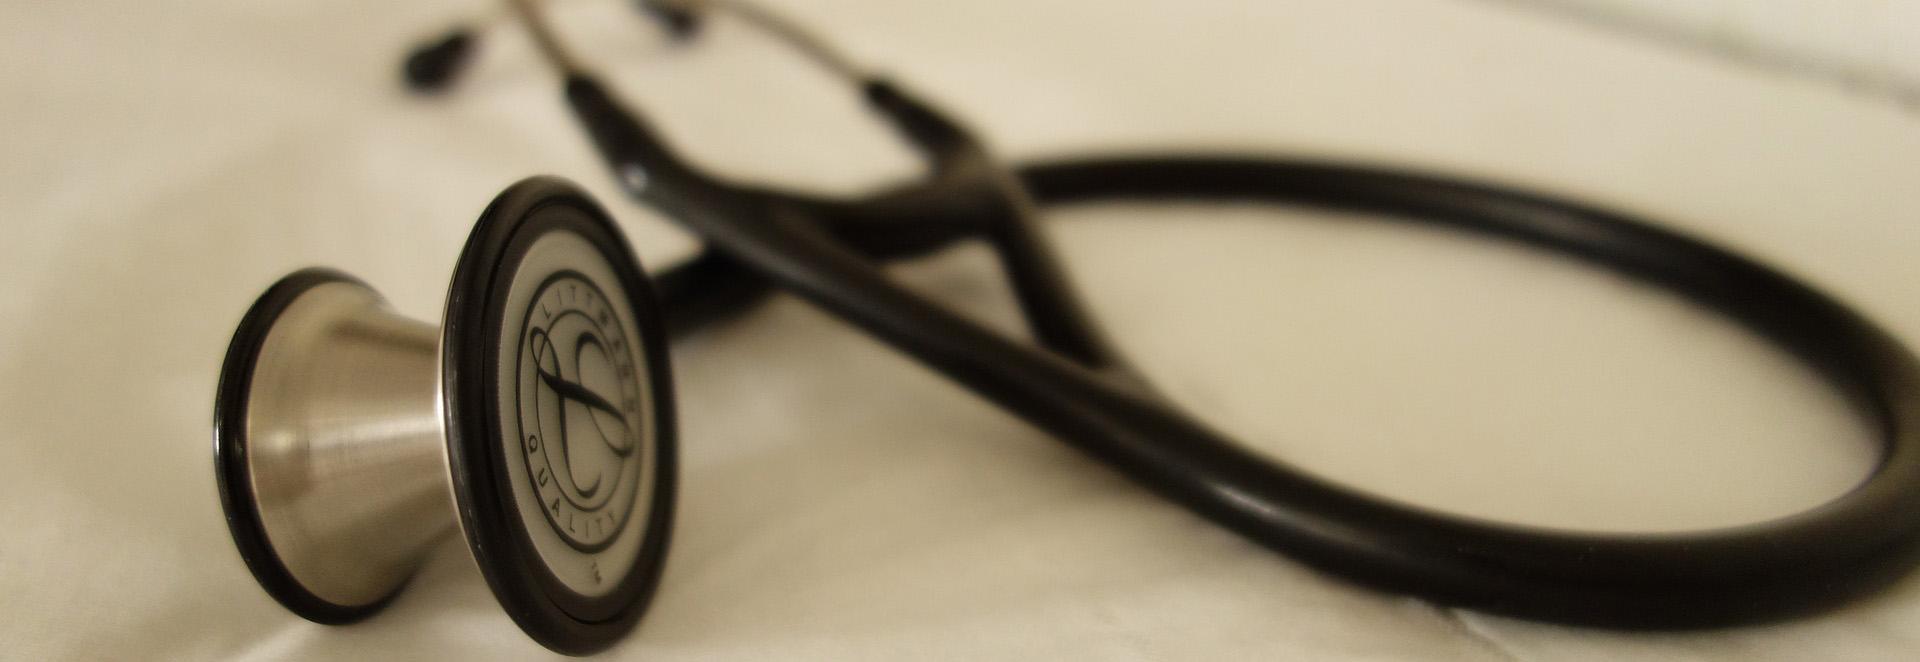 stethoscope-2359757_1920 2